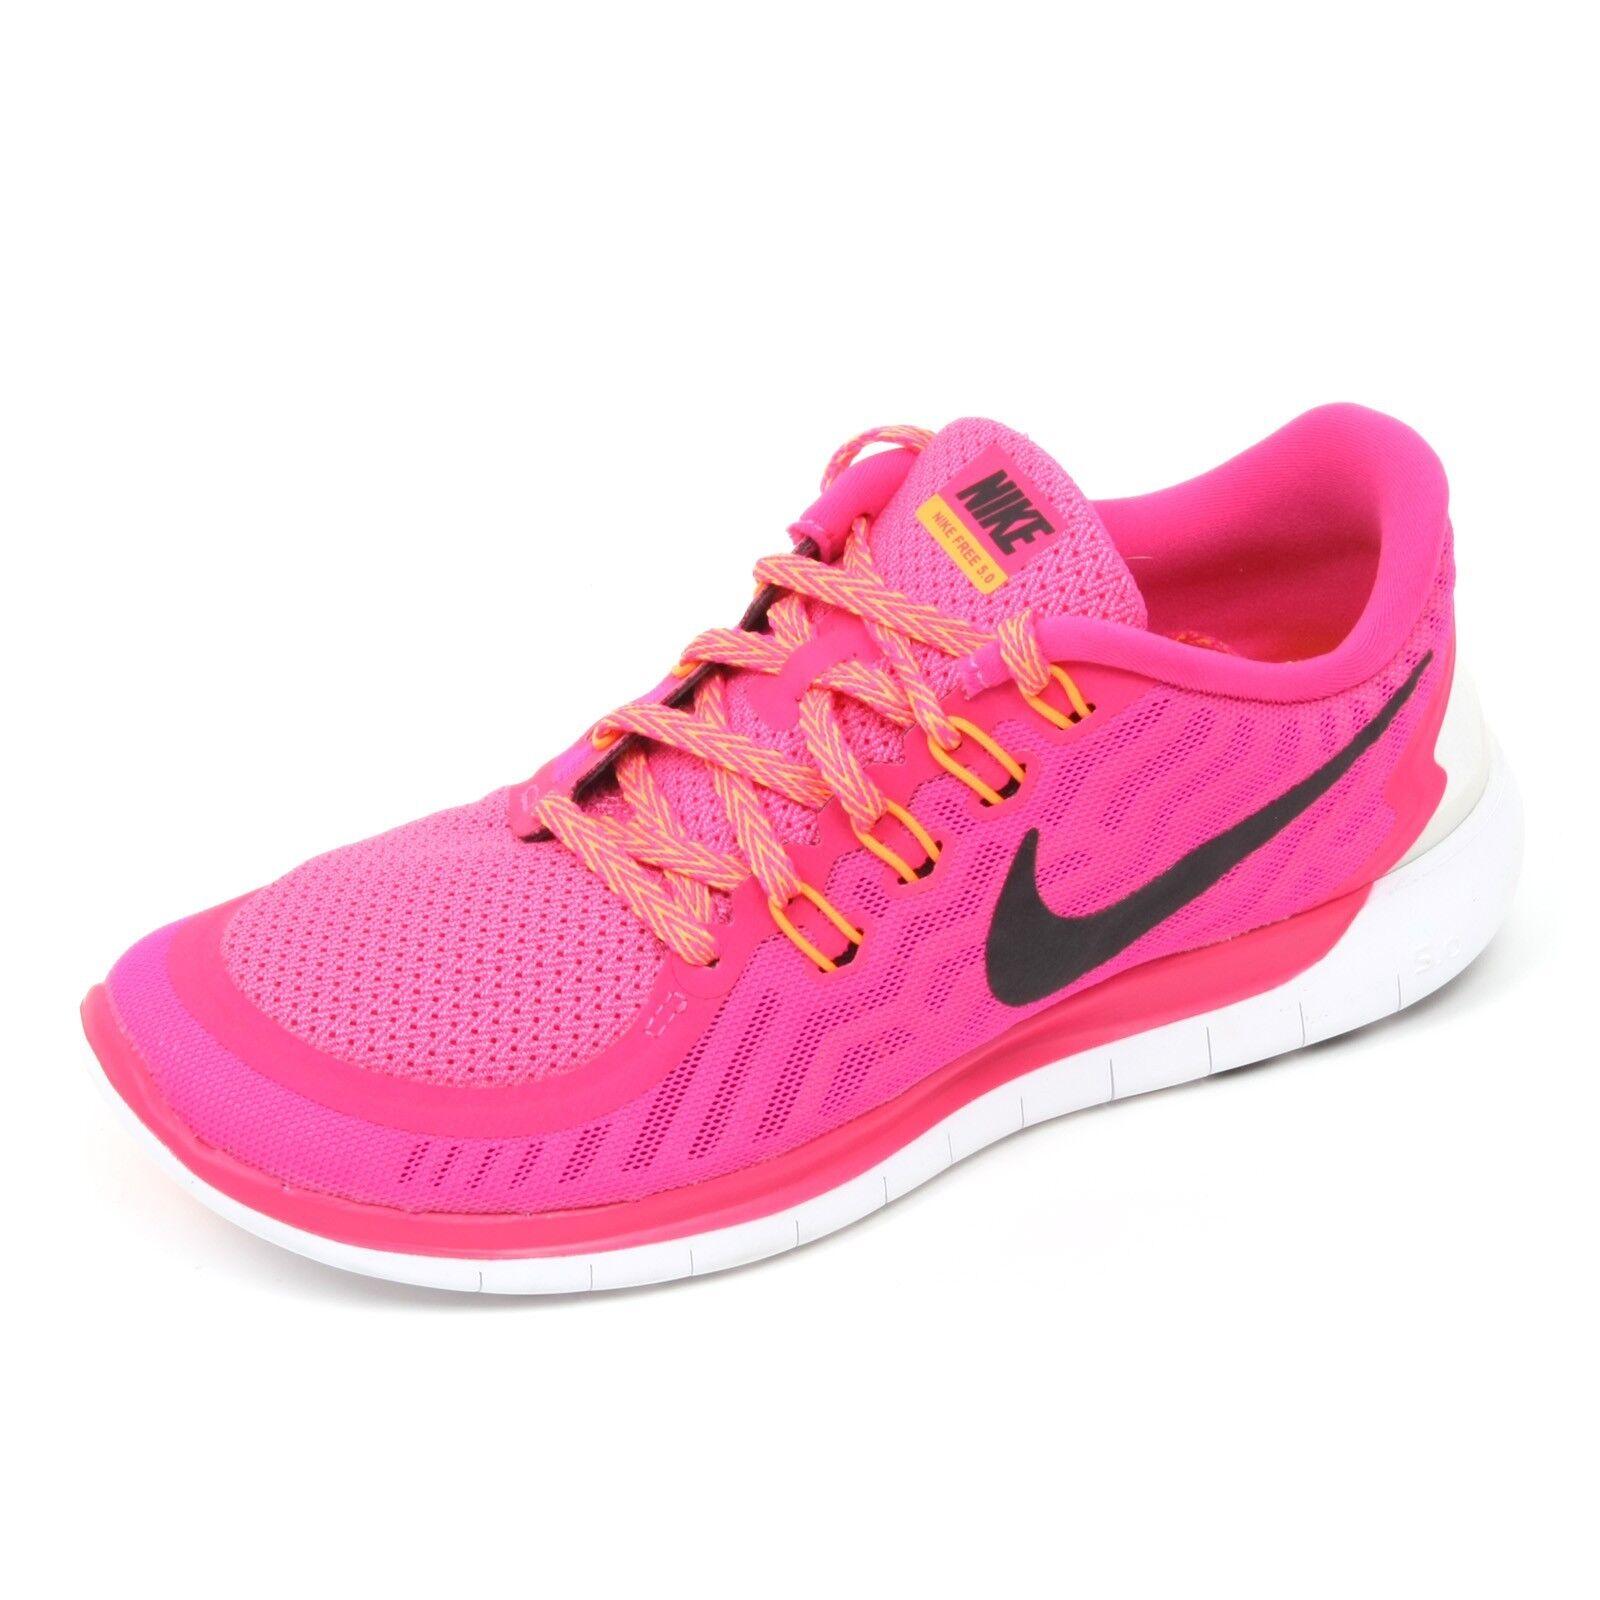 C5954 sneaker scarpa donna NIKE FREE 5.0 scarpa sneaker rosa fluo shoe woman b0646c